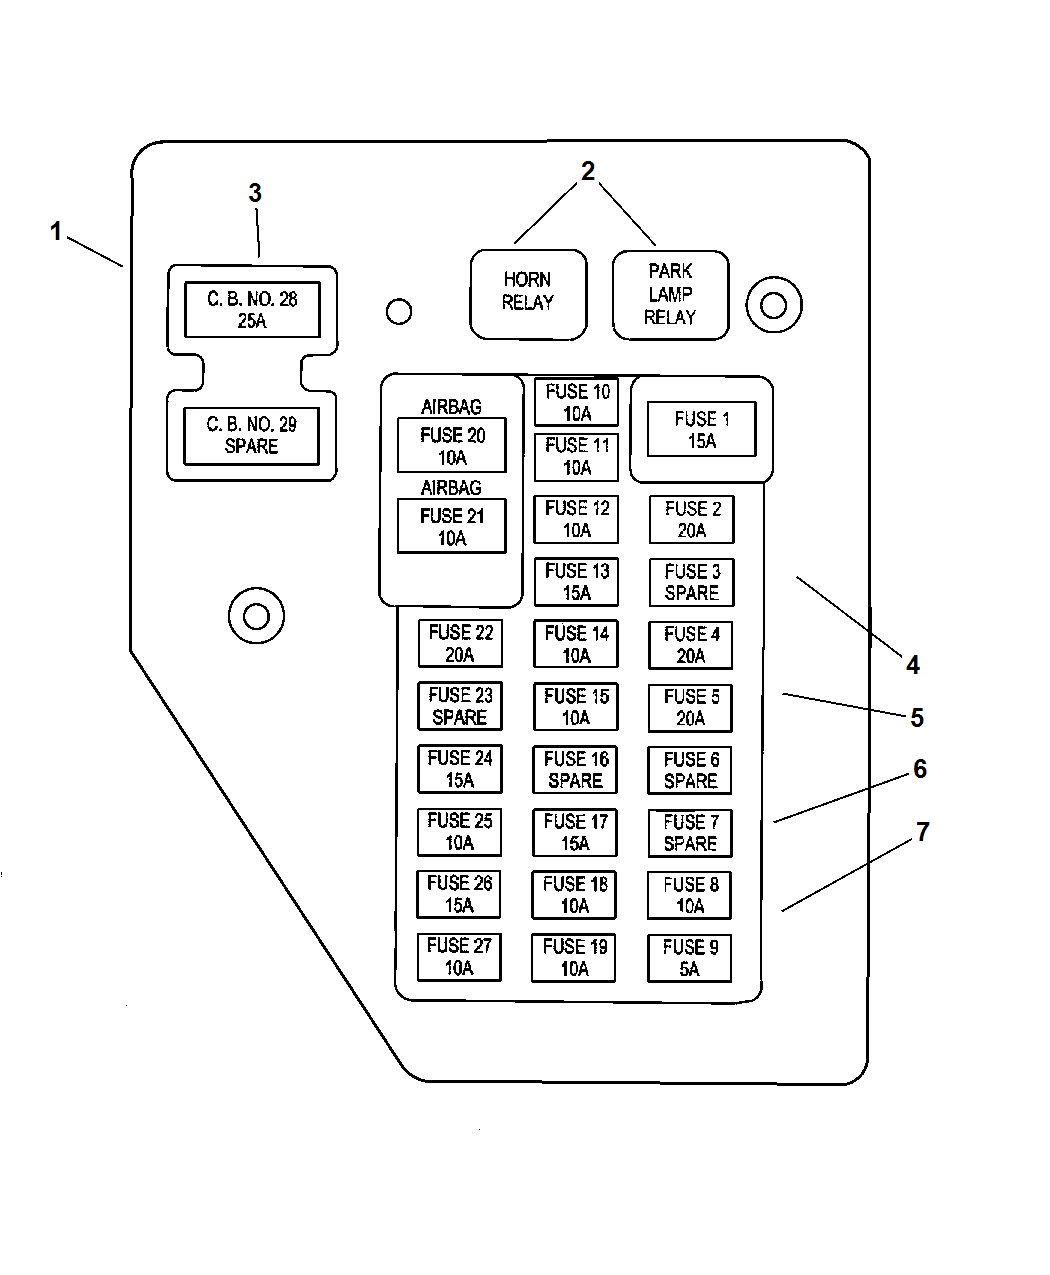 1994 dodge dakota fuse diagram - wiring diagram base central-a -  central-a.jabstudio.it  jab studio